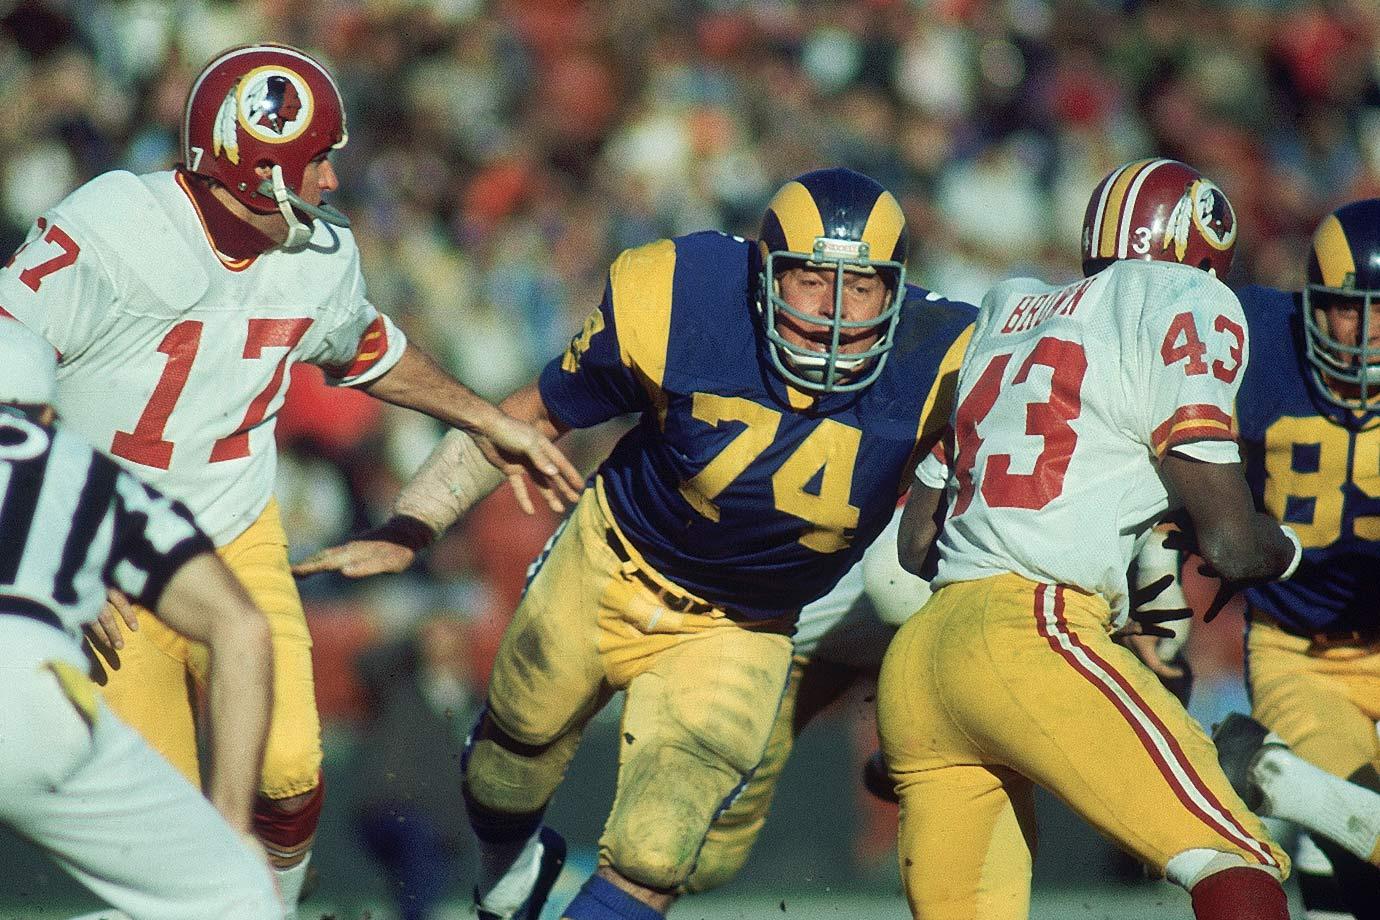 Dec. 22, 1974 — Los Angeles Rams vs. Washington Redskins